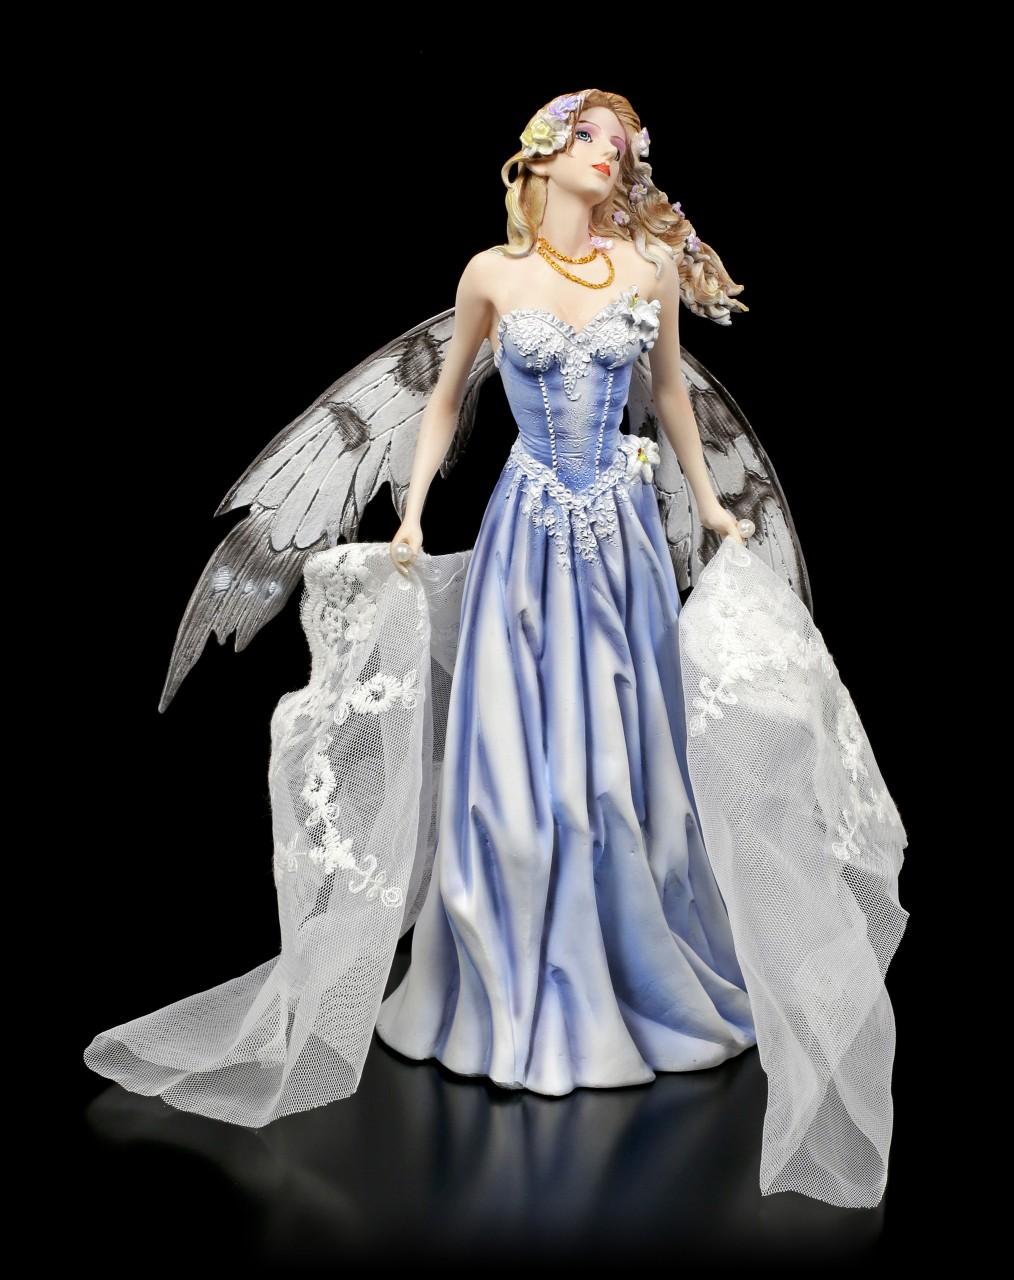 Fairy Figurine - Last Night by Nene Thomas